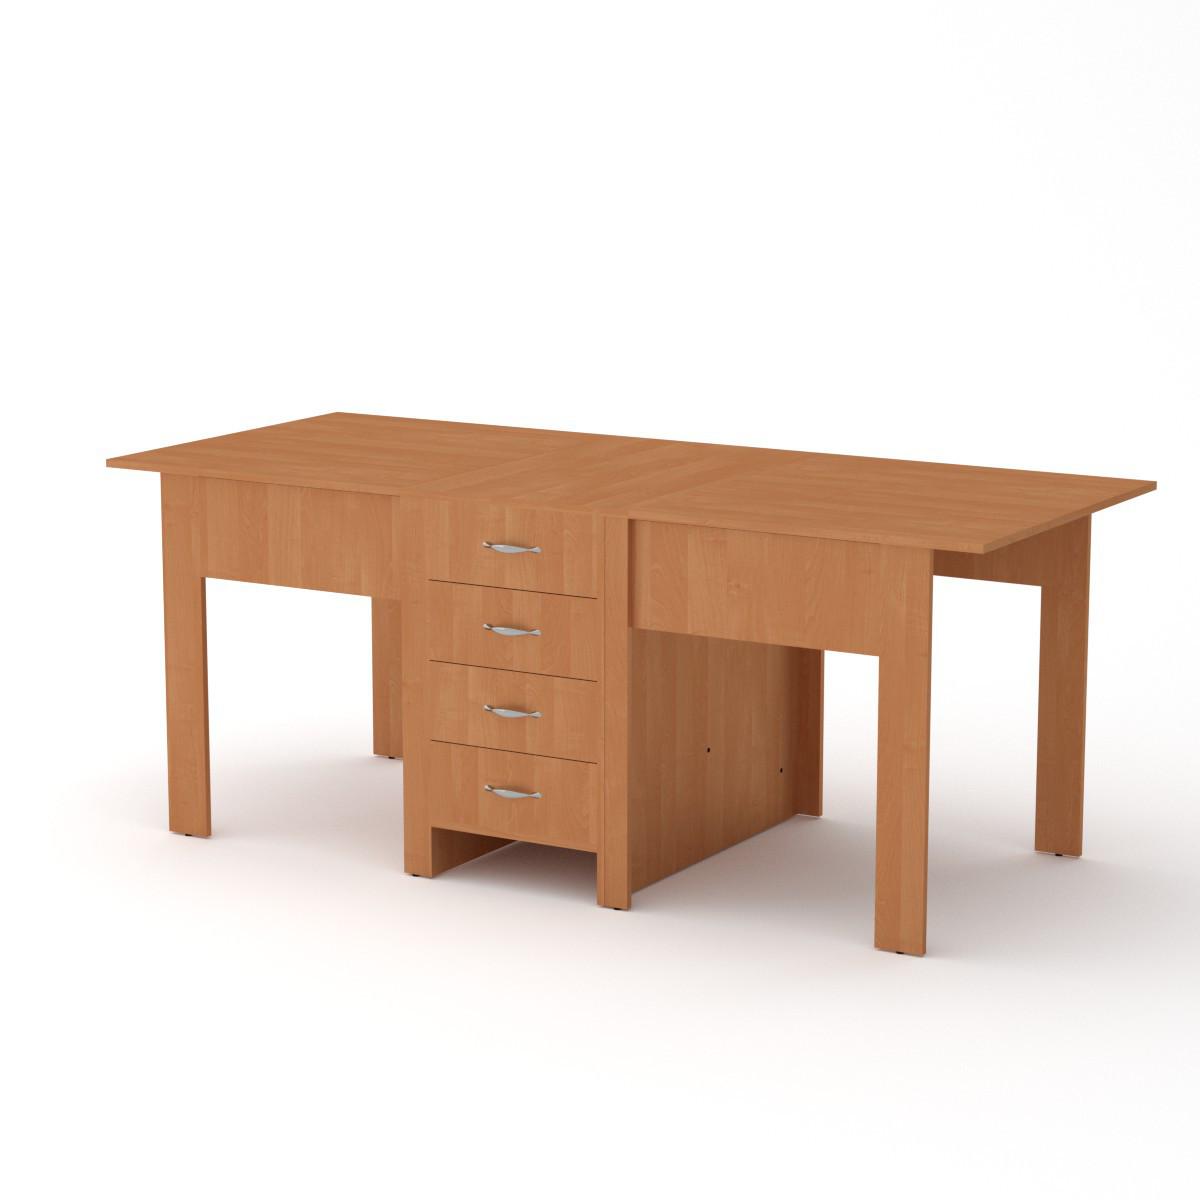 Стол книжка 3 ольха Компанит (190х80х75 см)